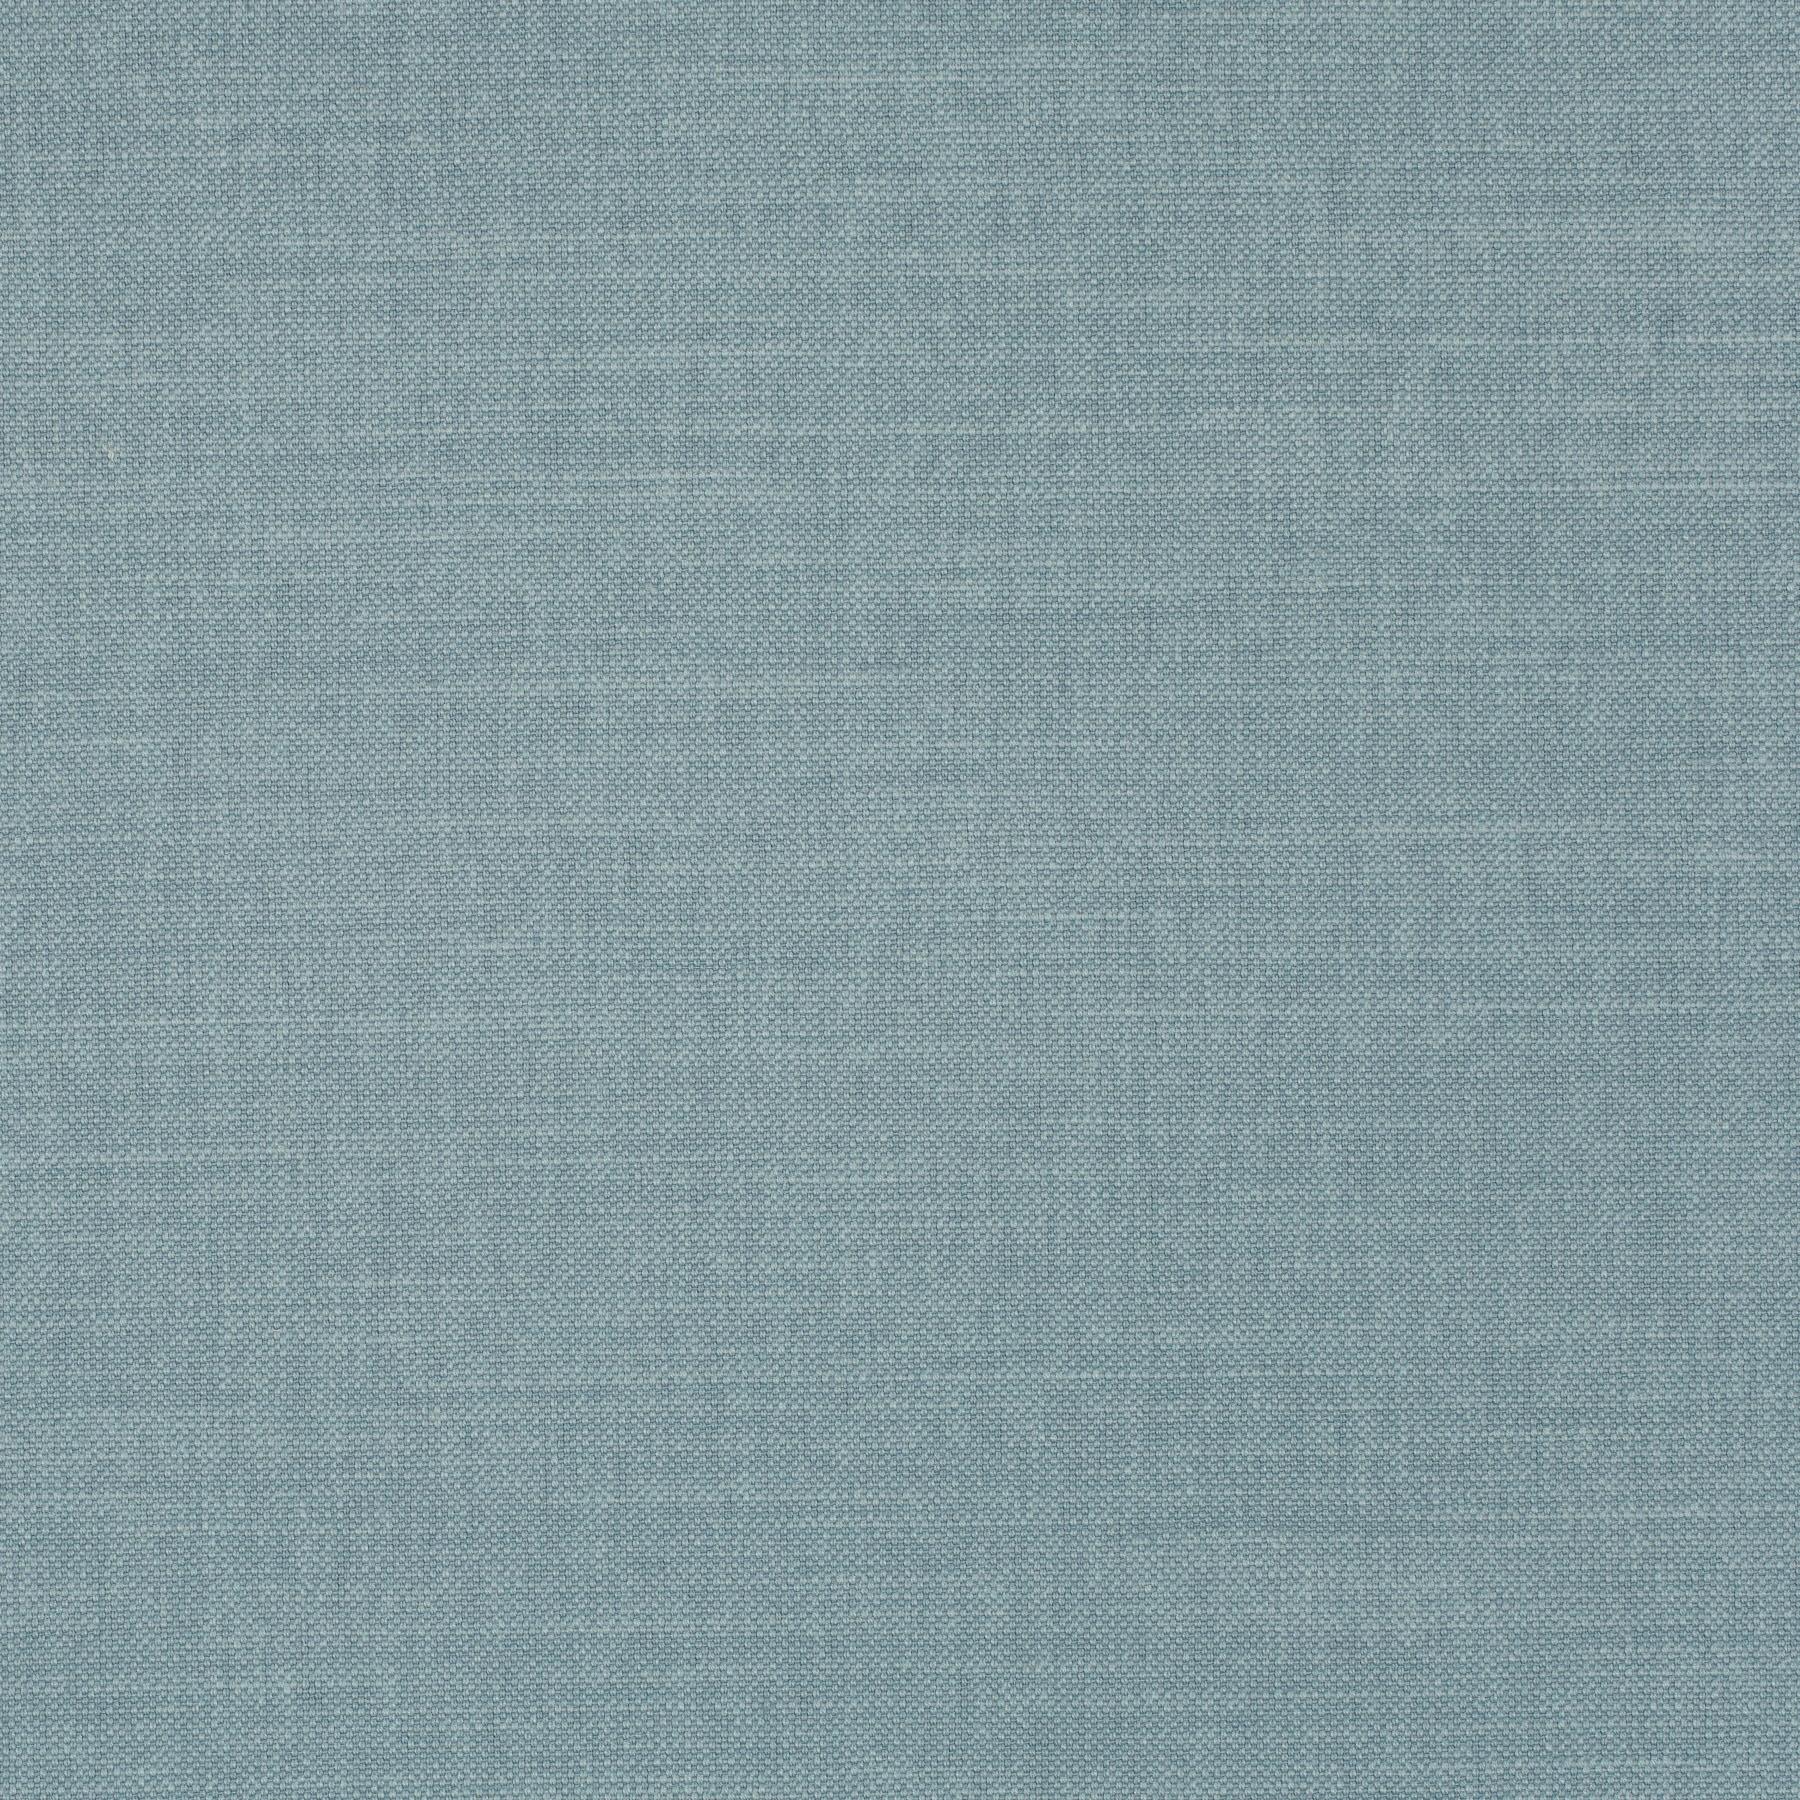 støvblå hot madison CH1249/718-0